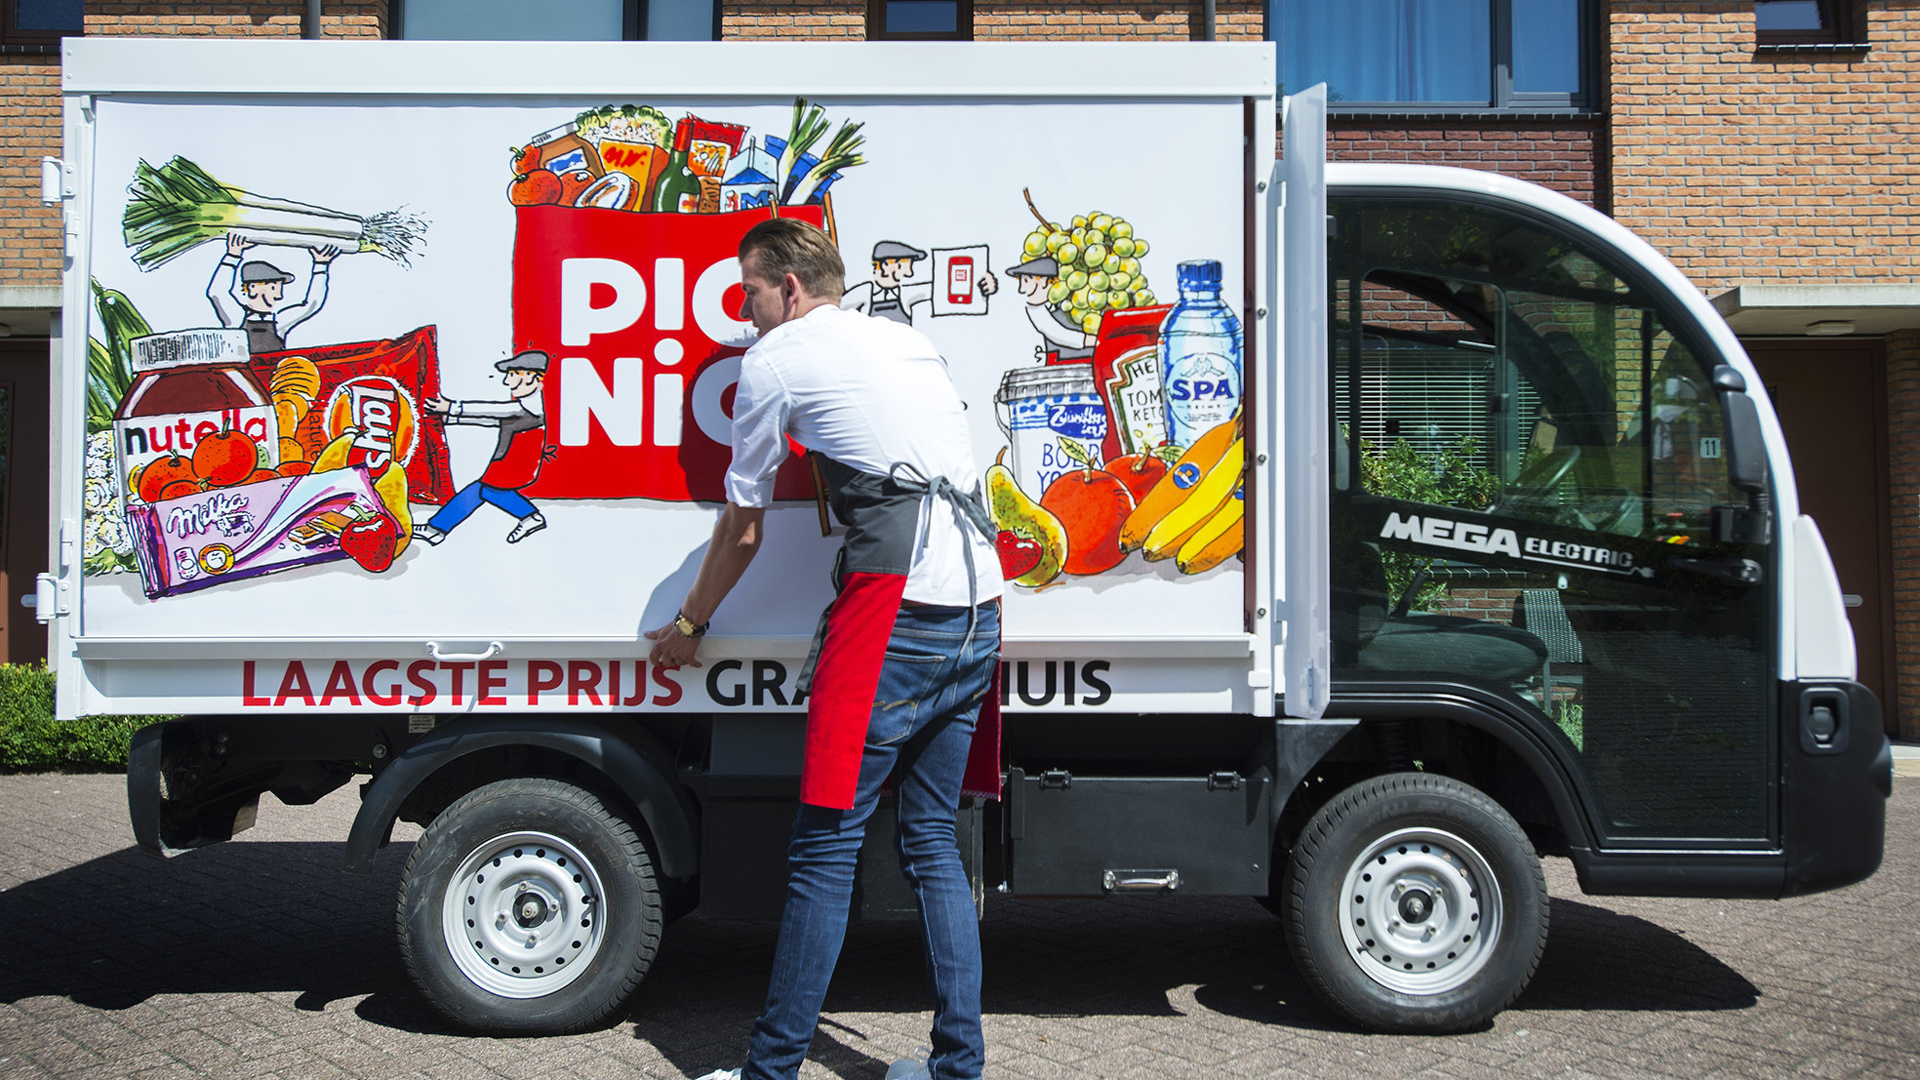 Overzicht openingstijden supermarkten pinksteren 2018 picnic